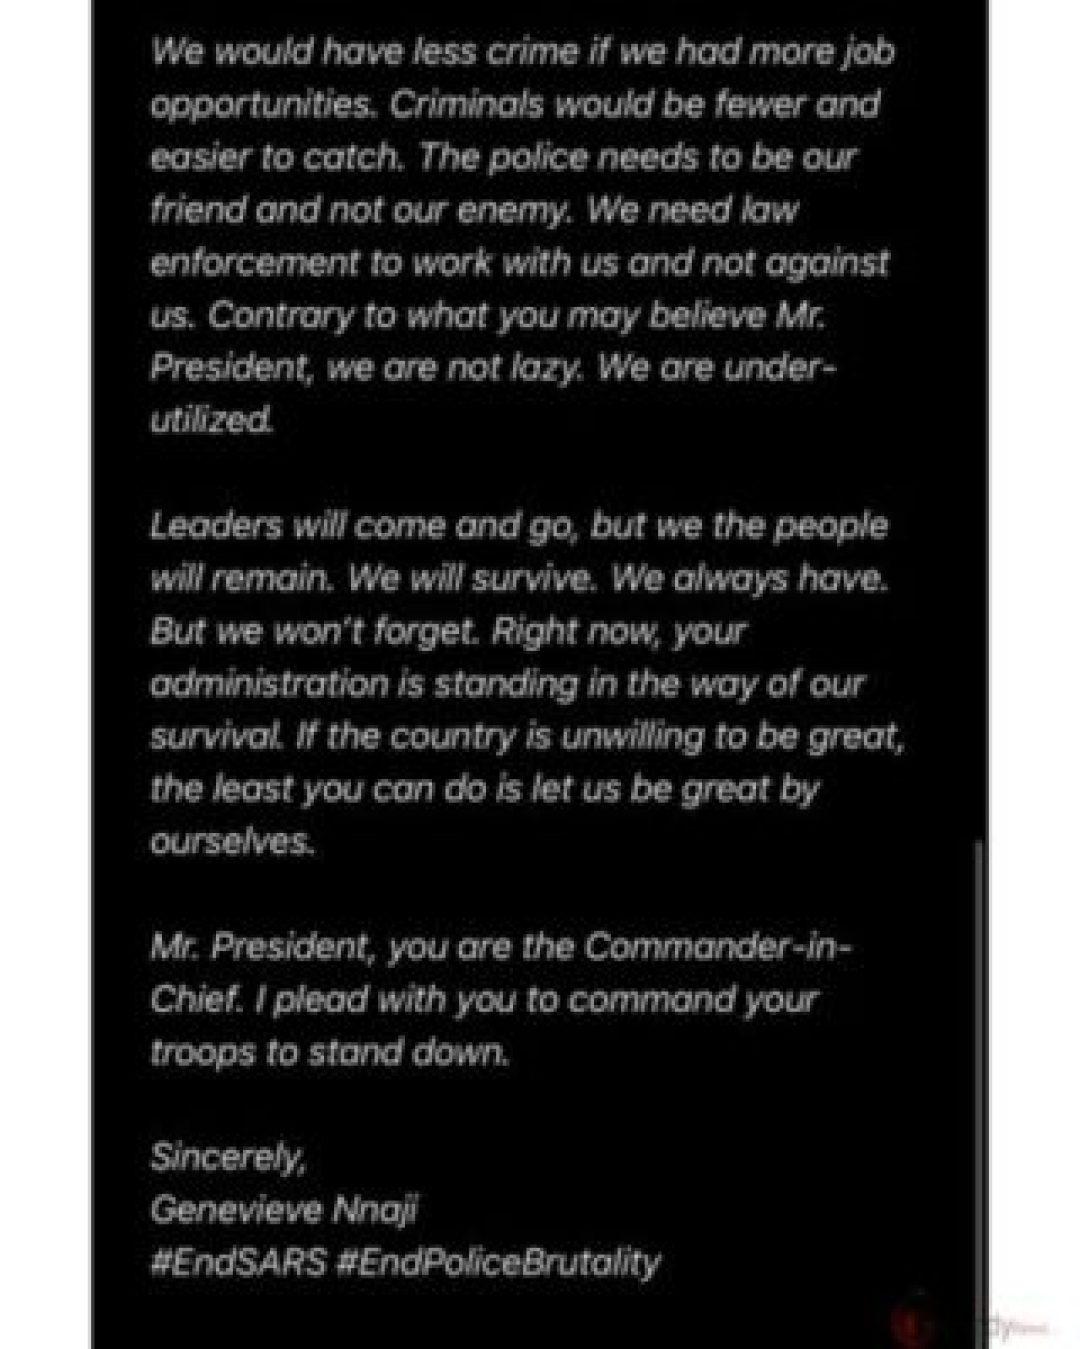 EndSARS: Genevieve Nnaji Writes An Open Letter To President Buhari